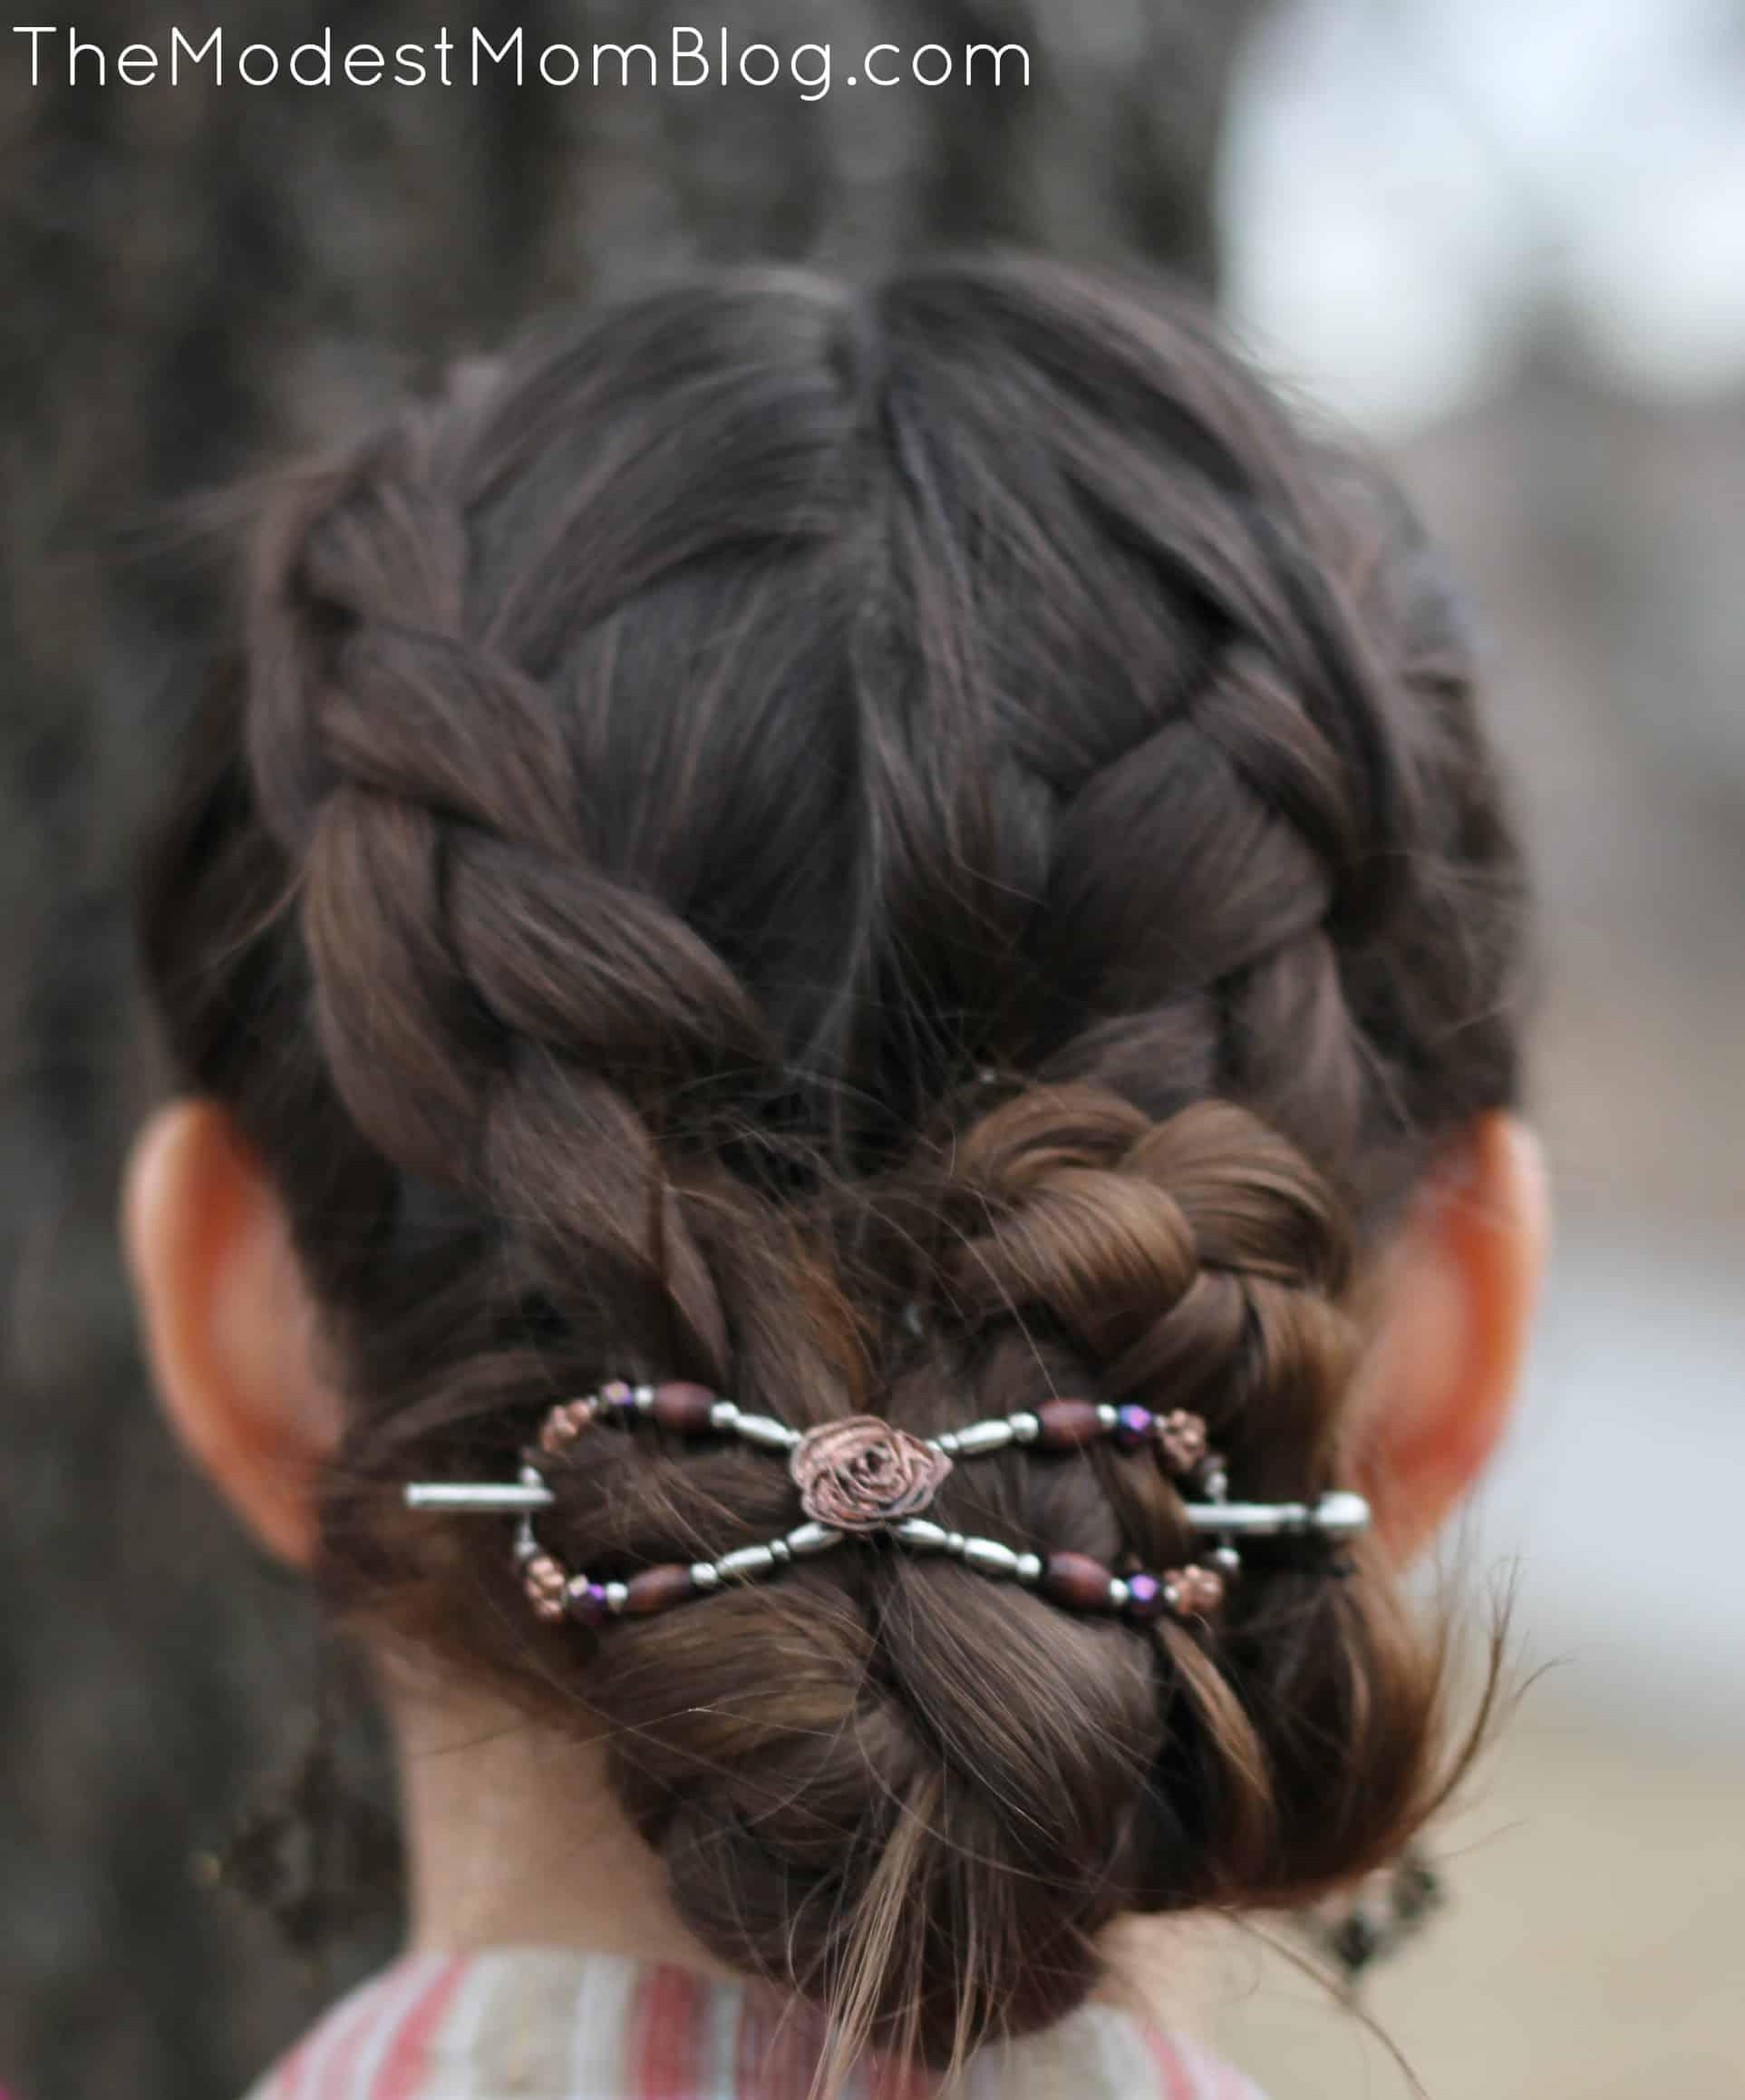 Braided Hair with Flexi Clip | themodestmomblog.com